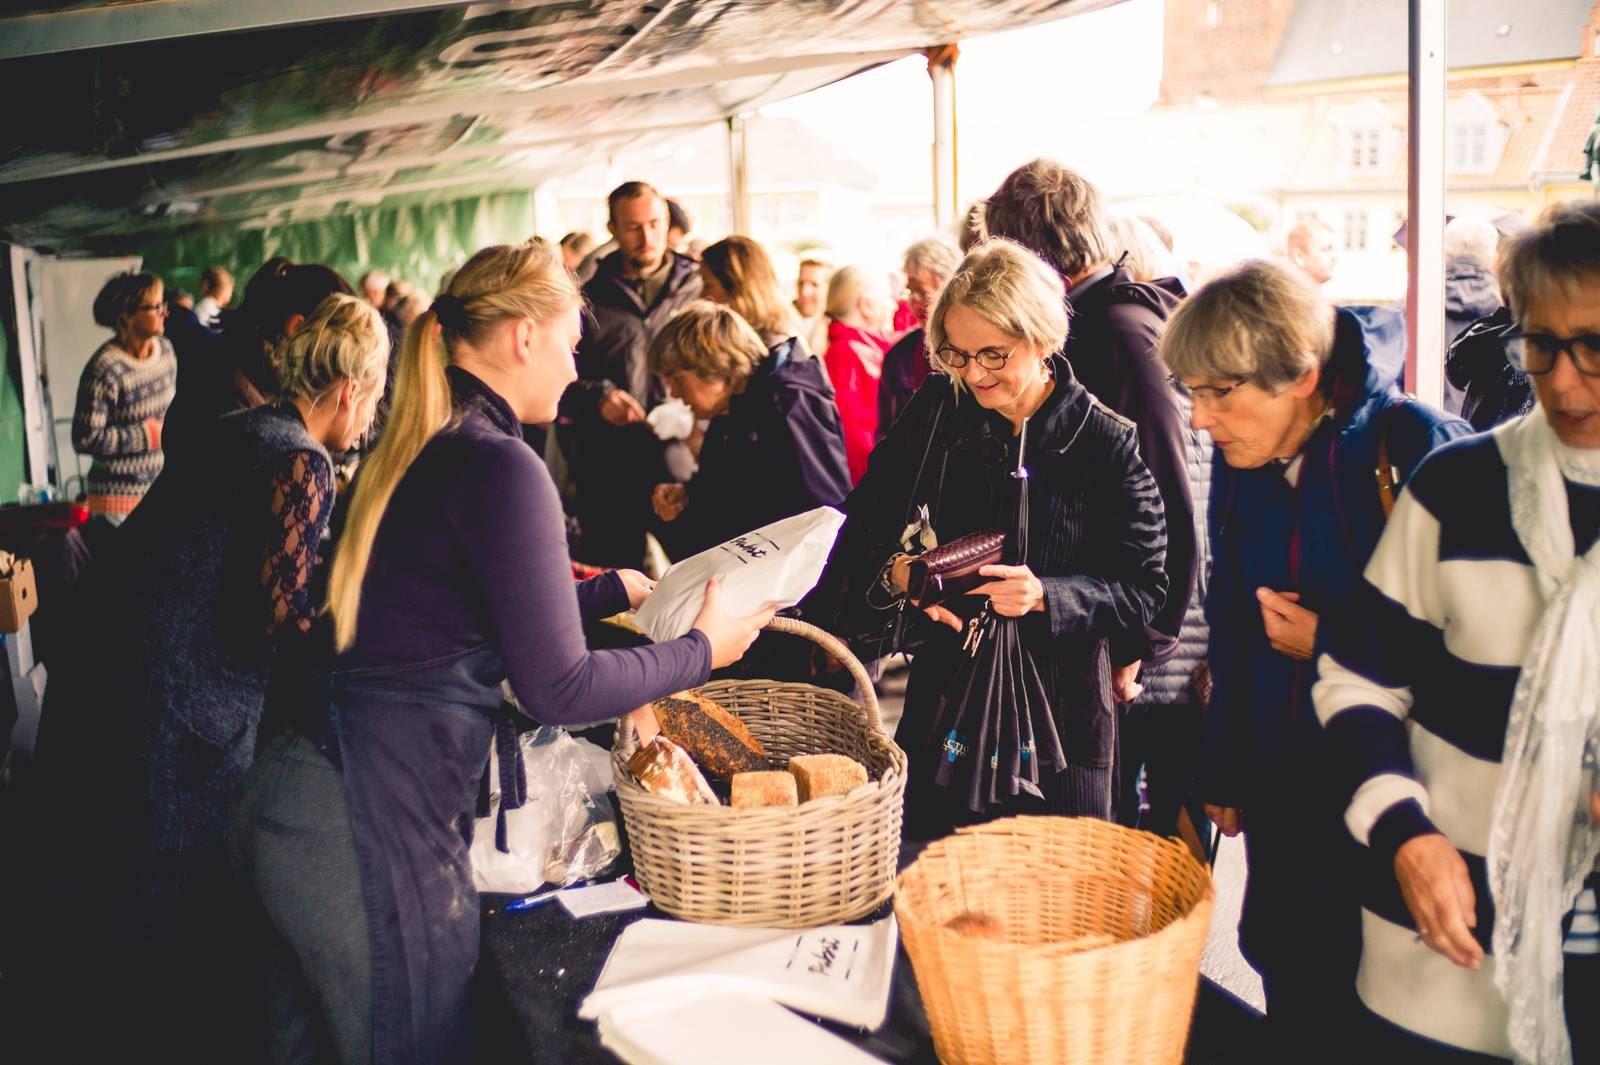 © Kamilla Becker Larsen, Nakskov Food Market - Fødevaremarked